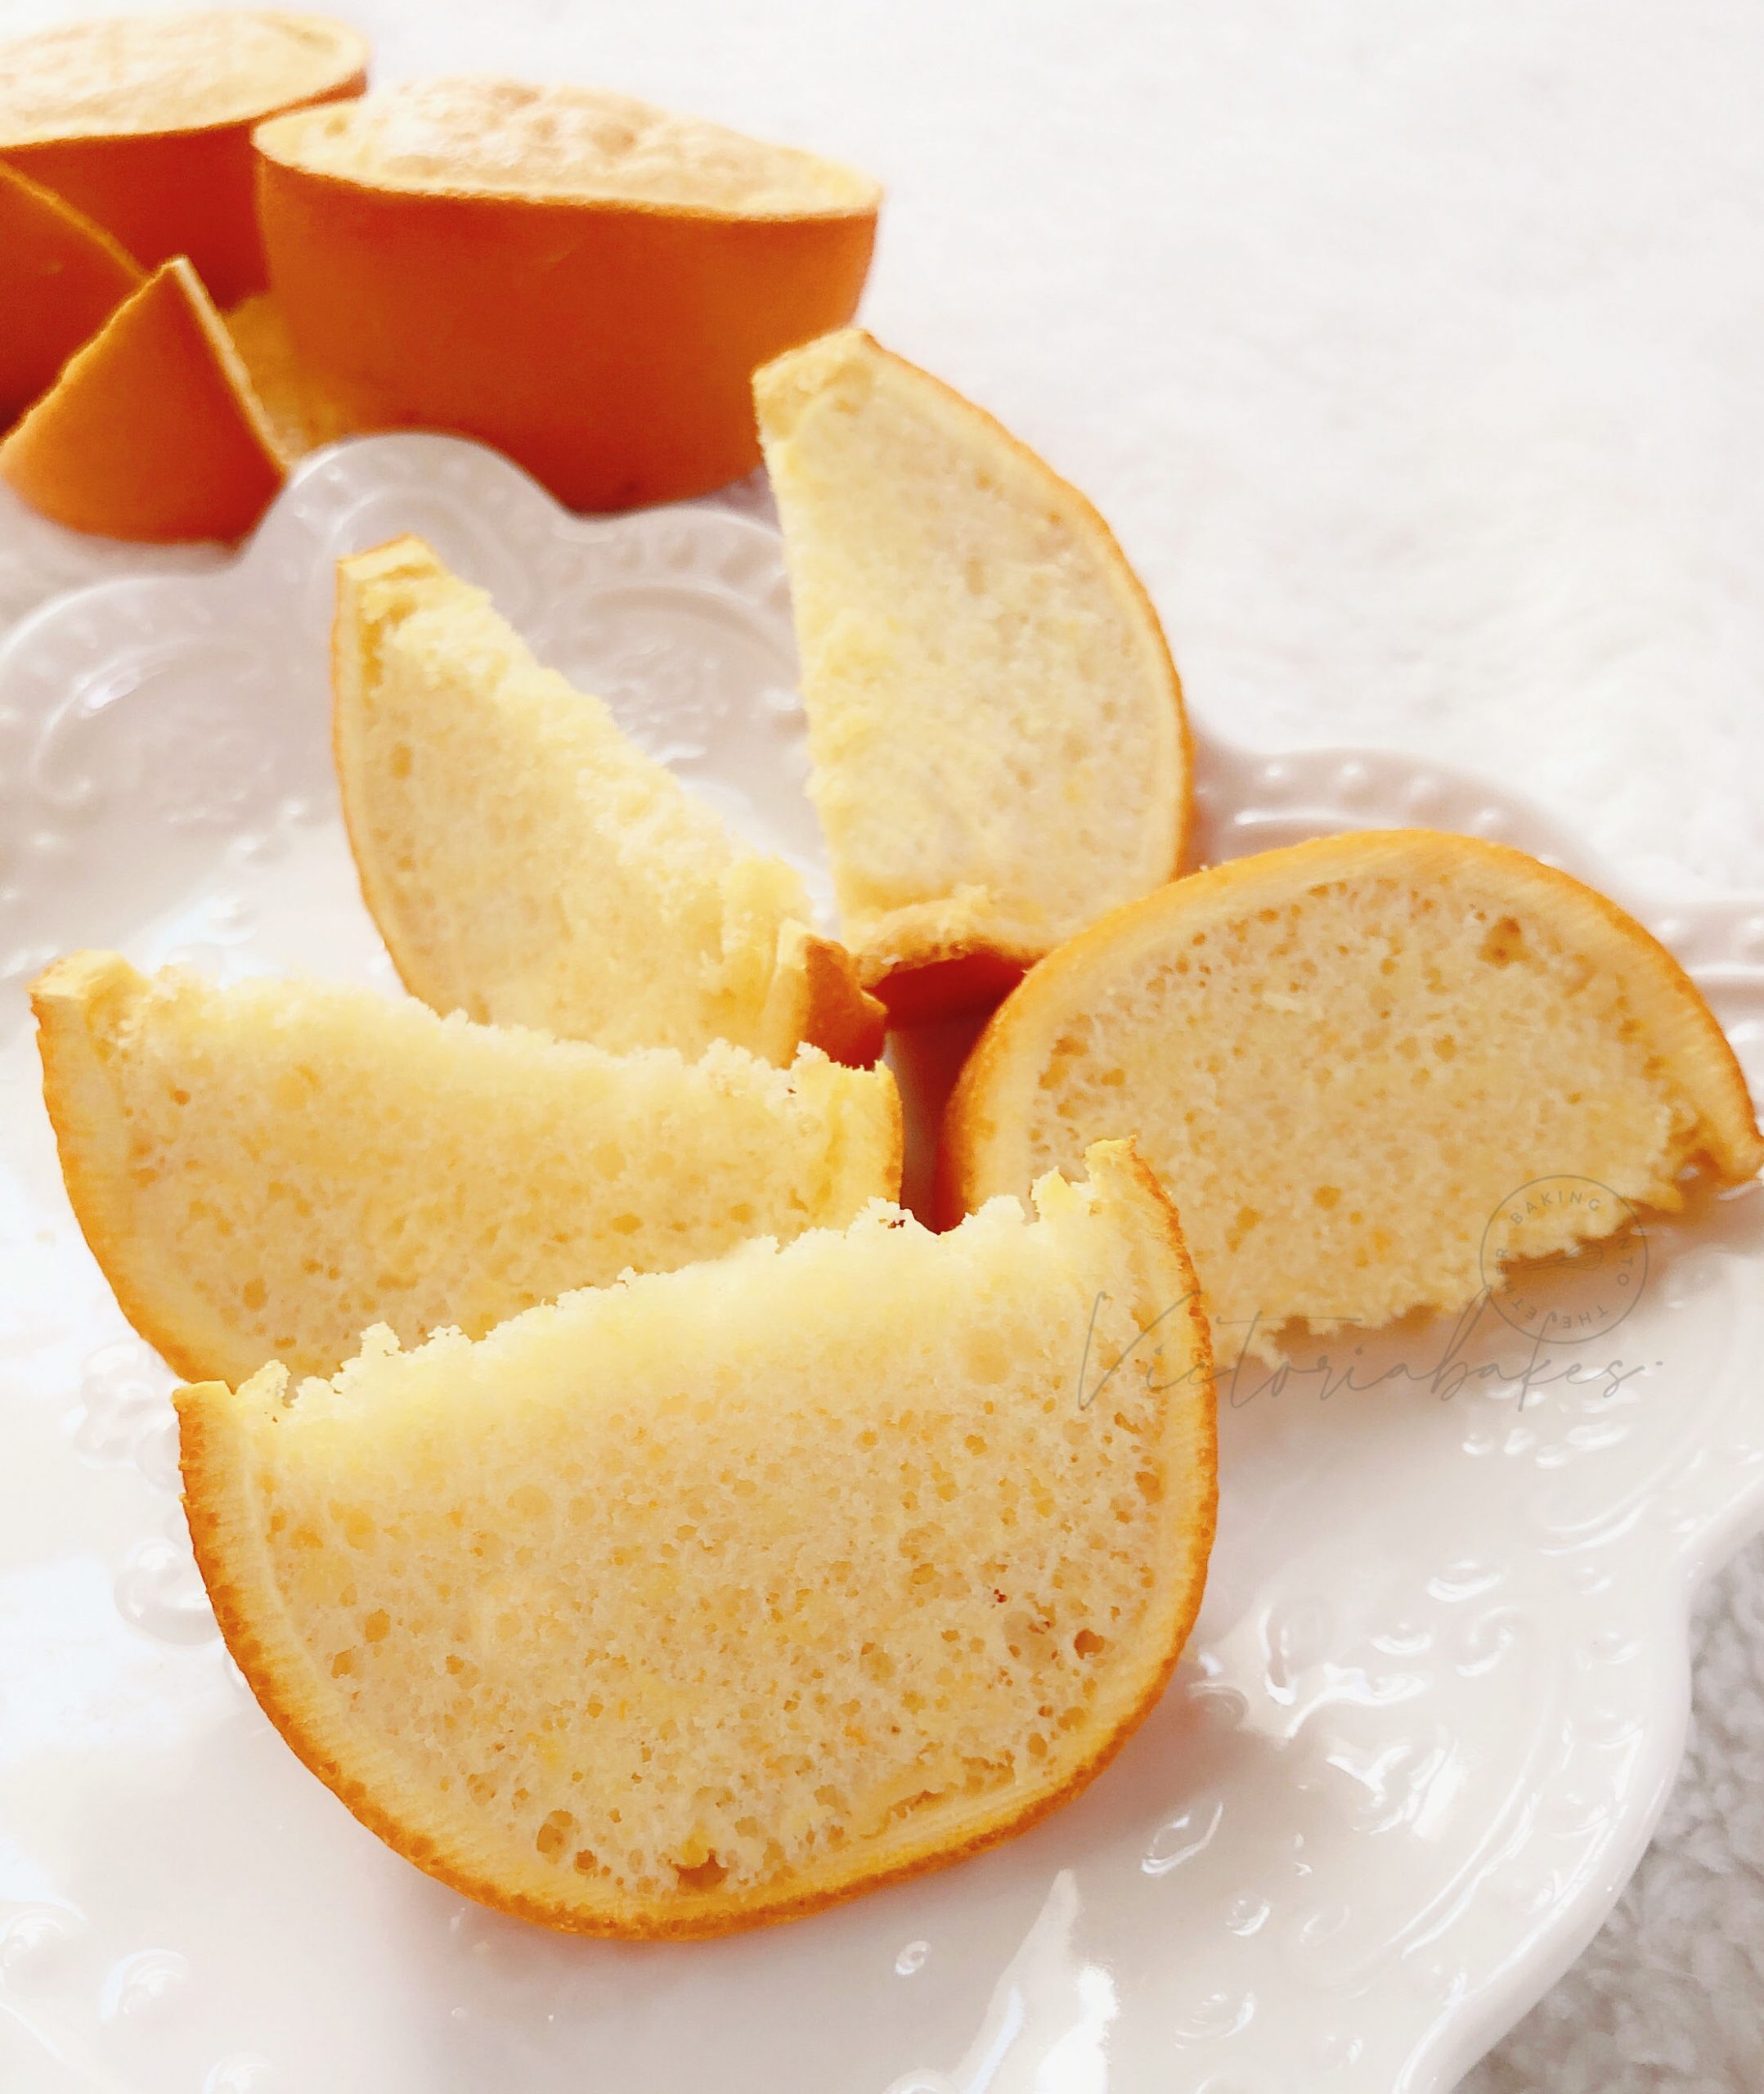 mini chiffon cake in the orange 香橙中的迷你香橙戚风蛋糕